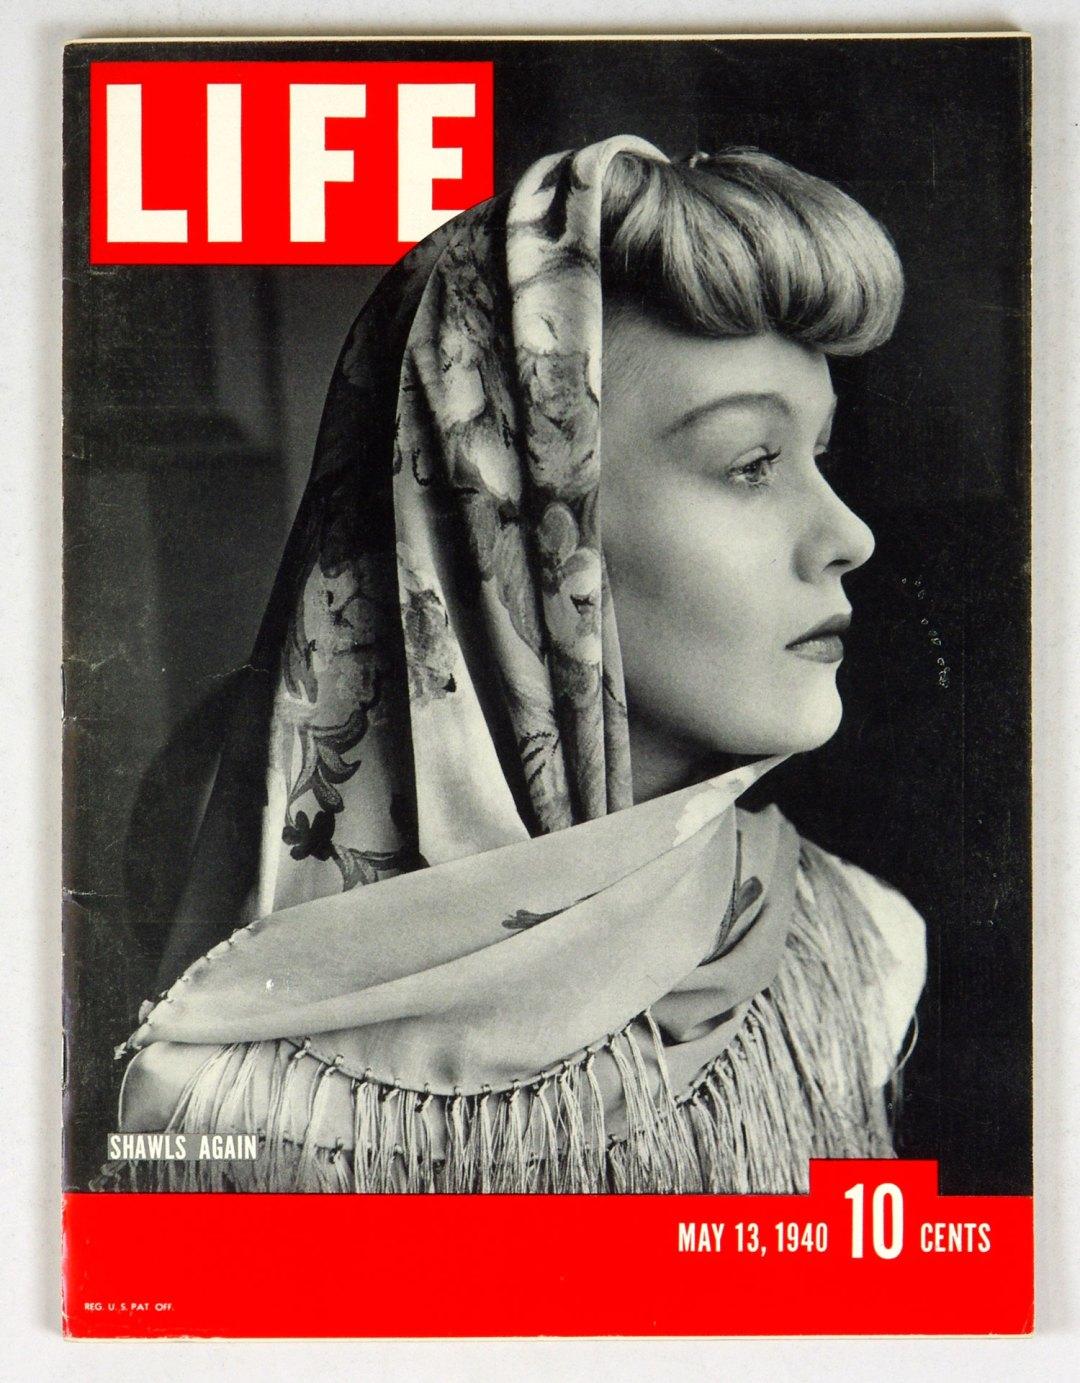 LIFE Magazine 1940 May 13 Shawls Again